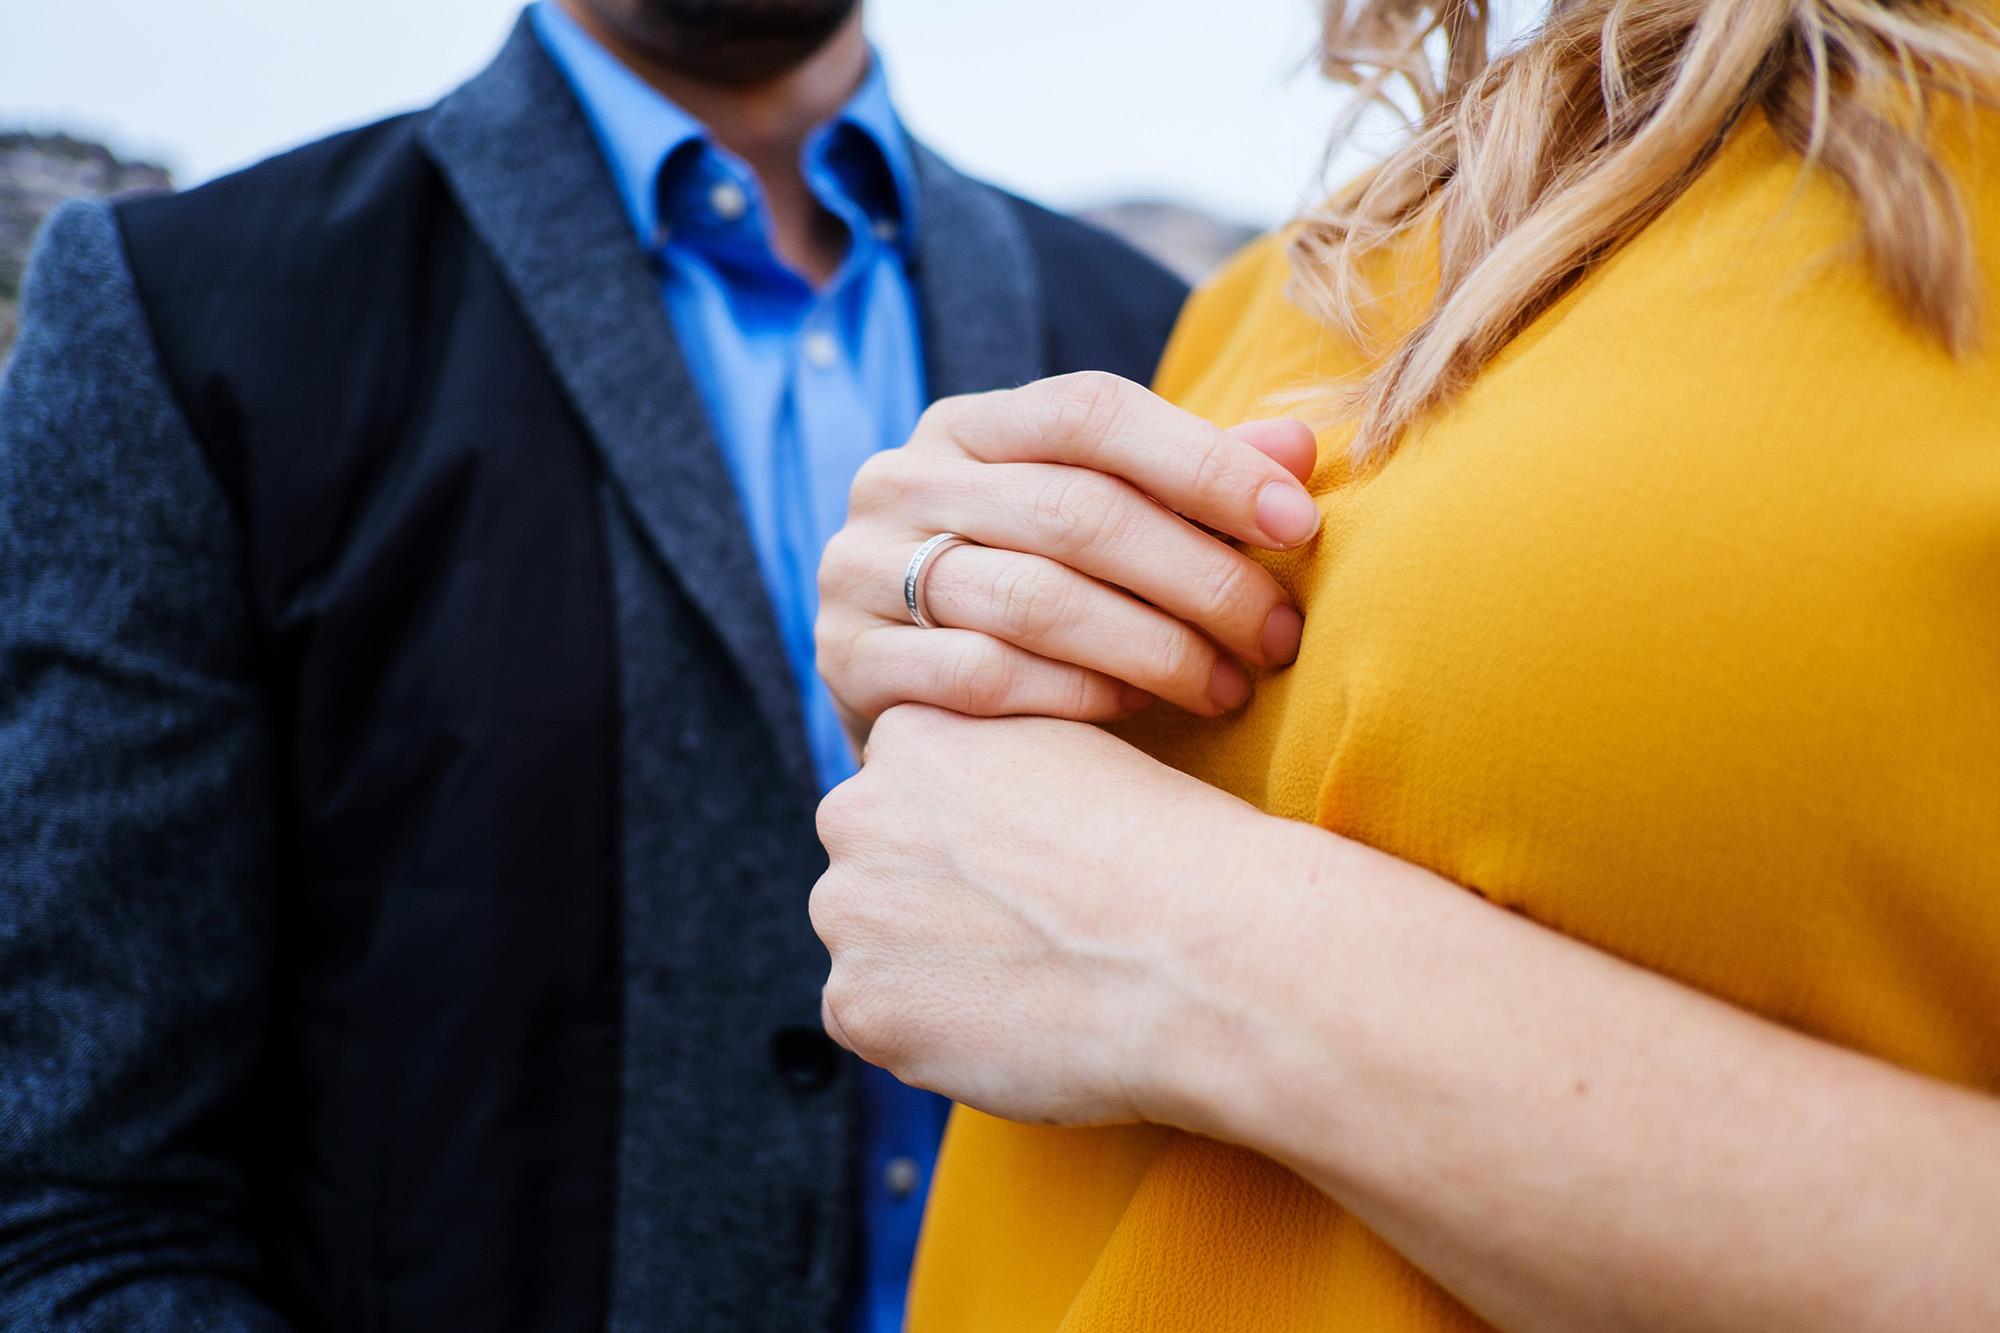 09_close-up-hand-engaged